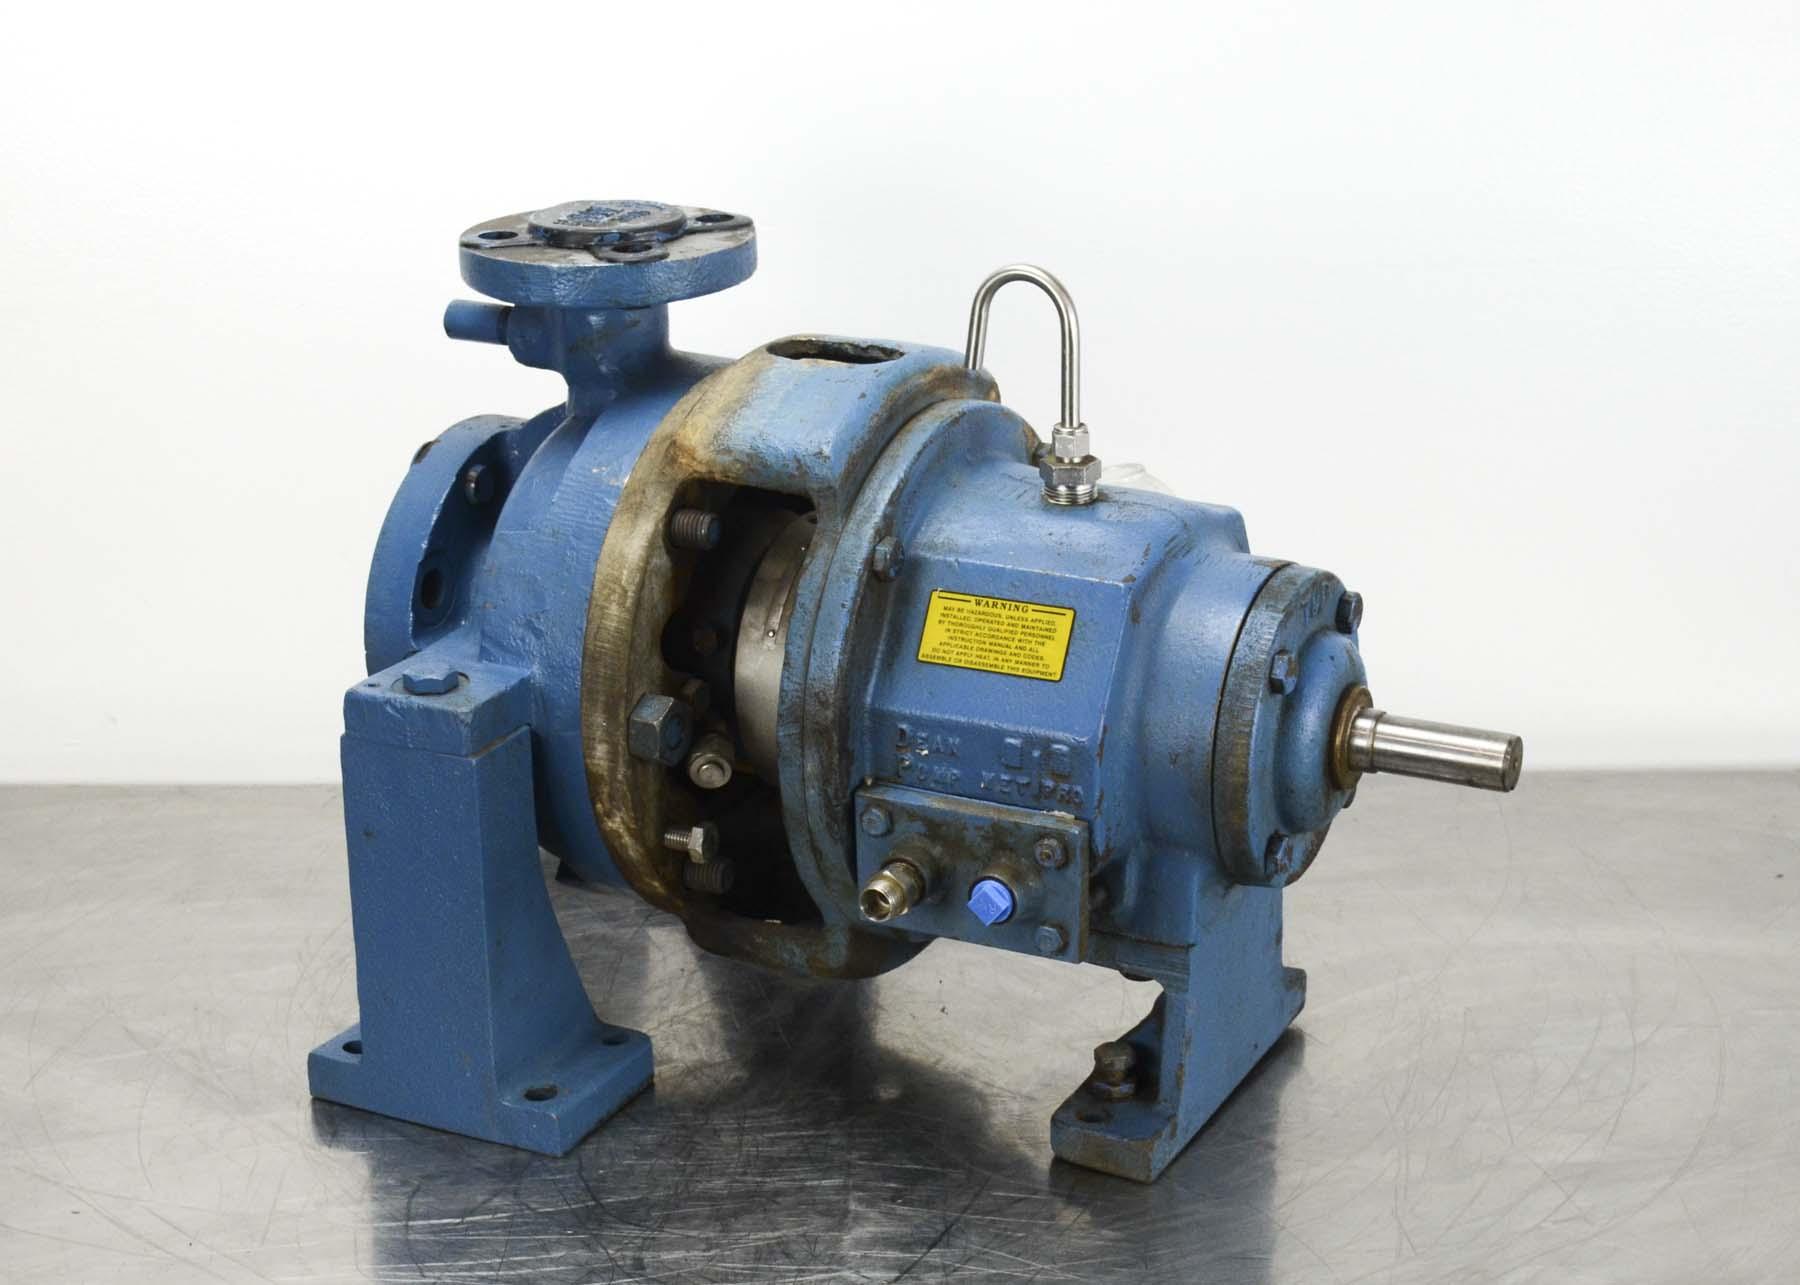 Dean Brothers R5144 Pump